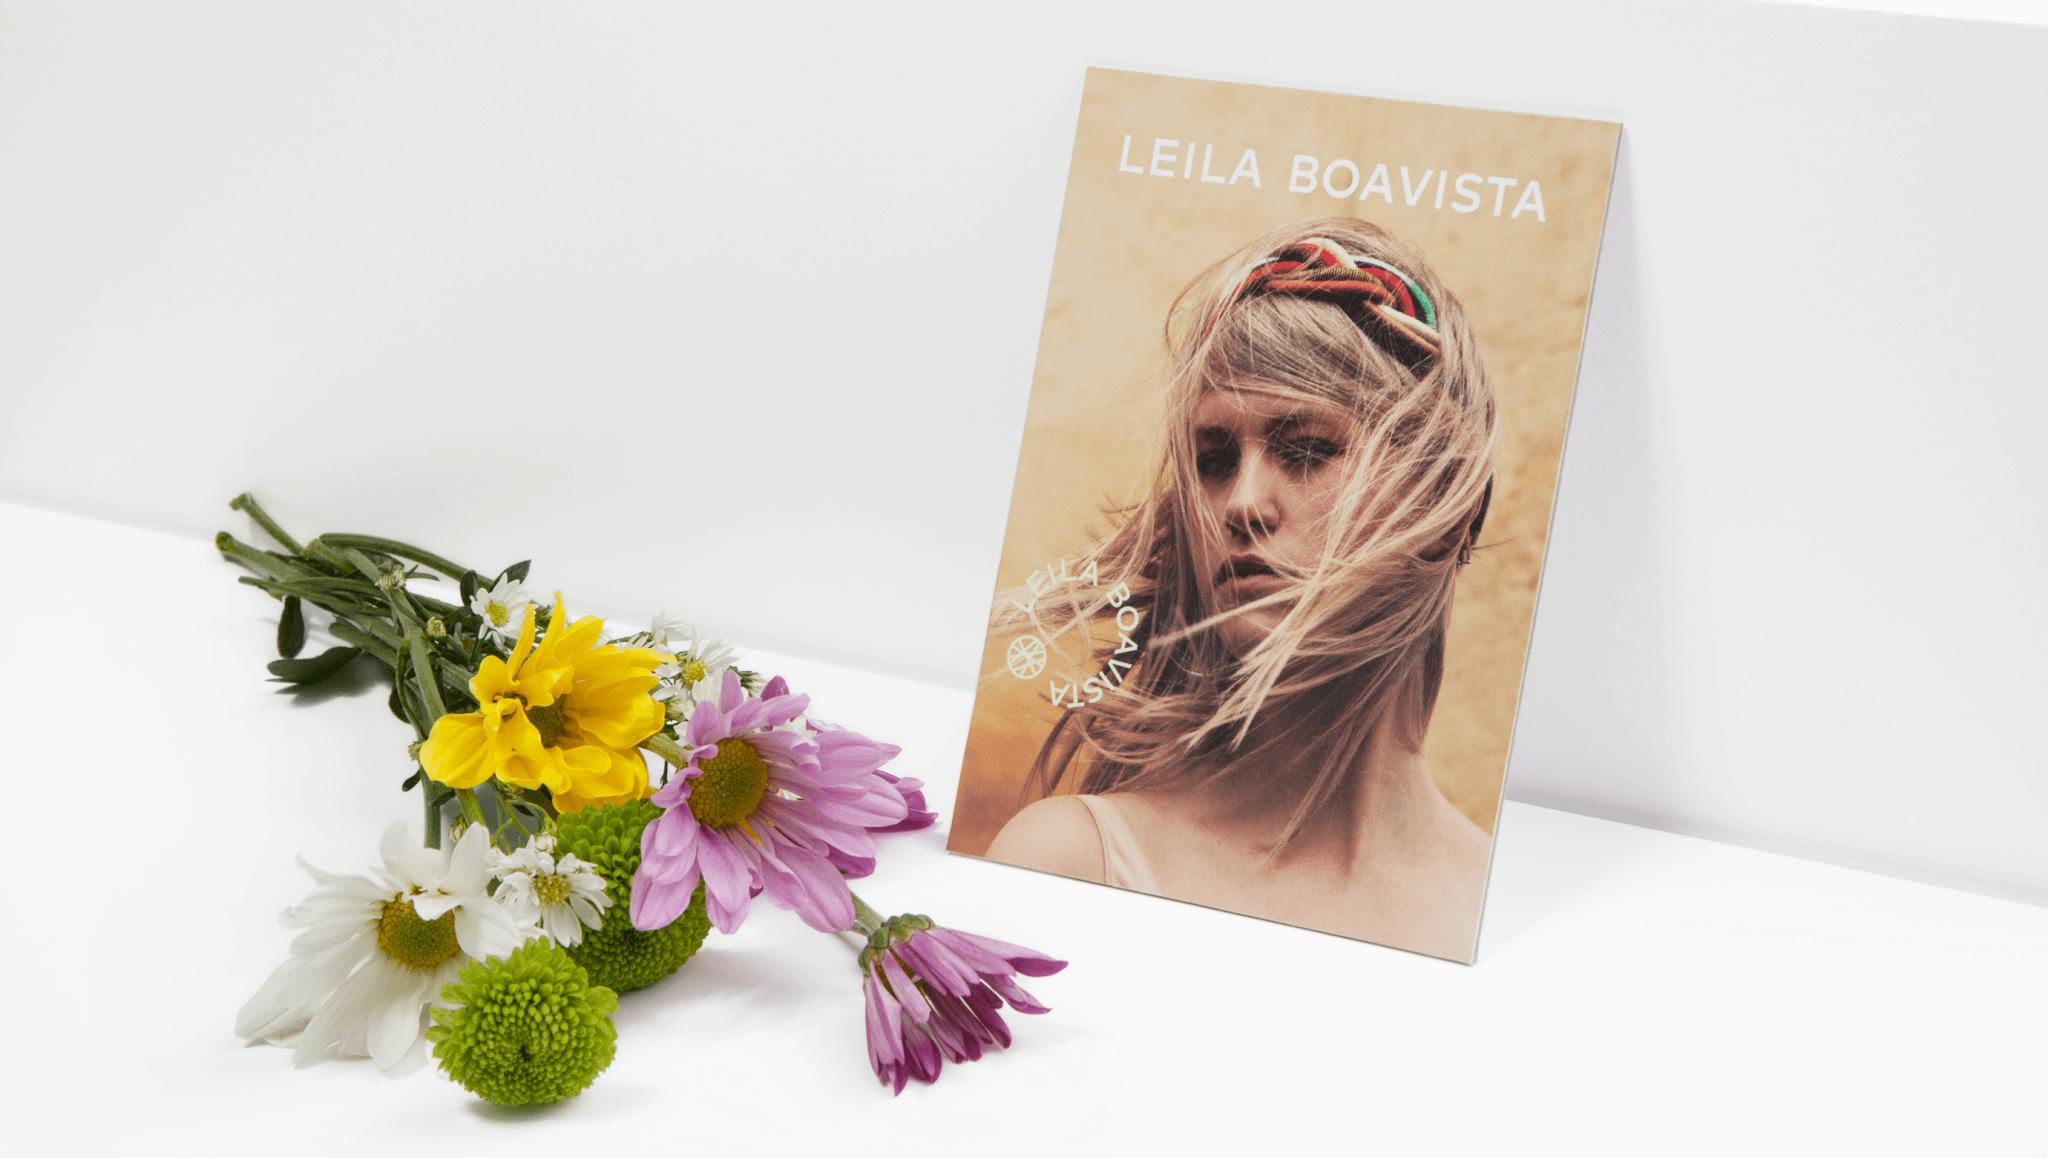 Leila Boavista